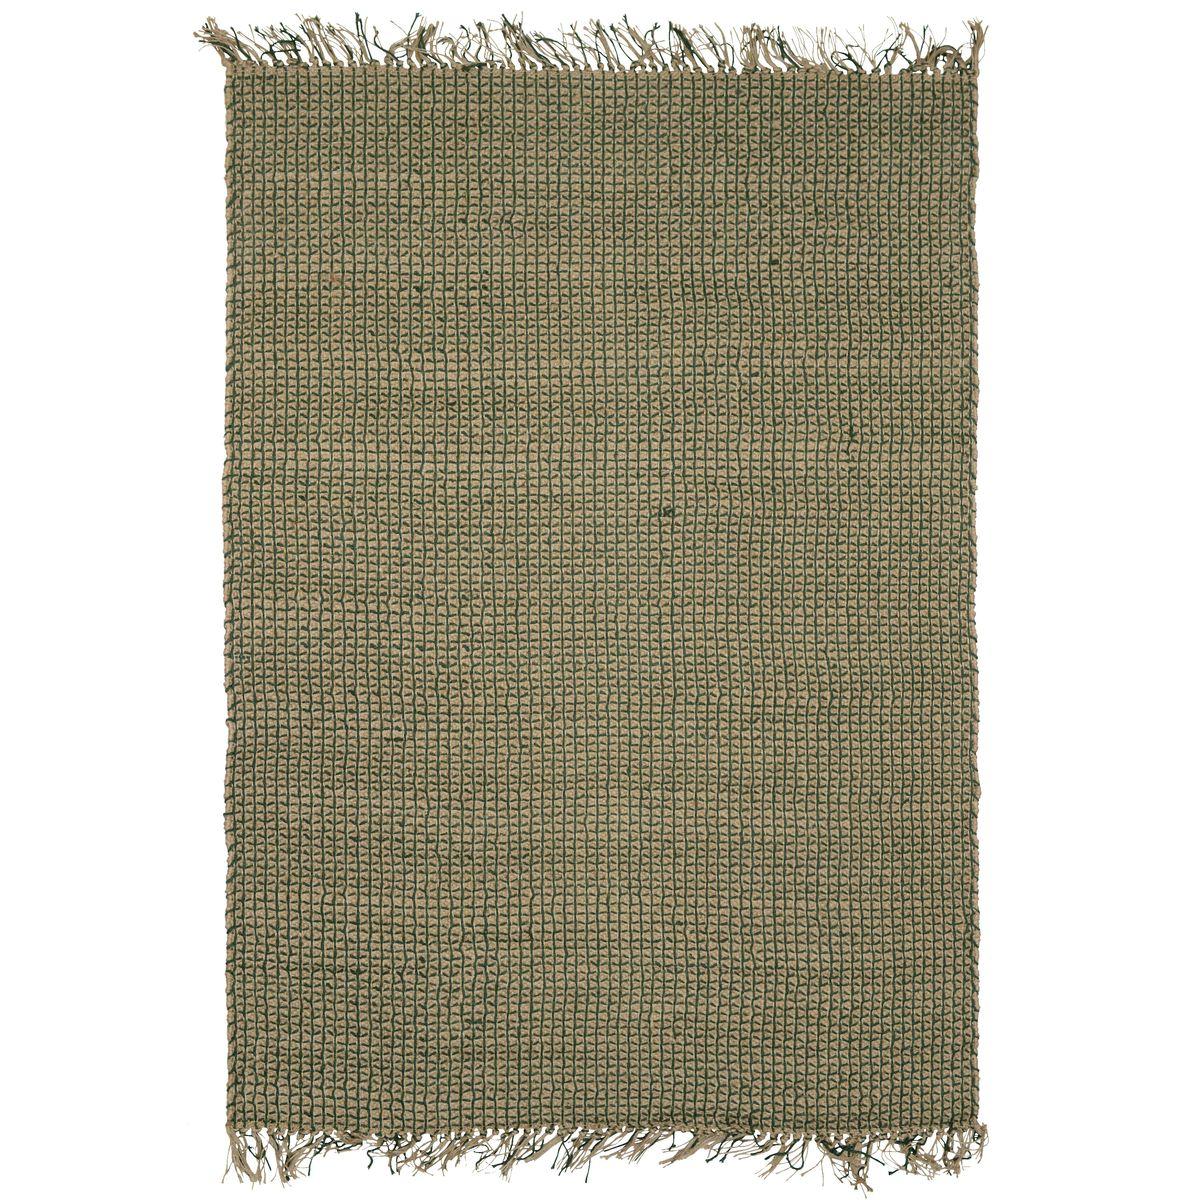 Tapis en jute et coton vert 160x230